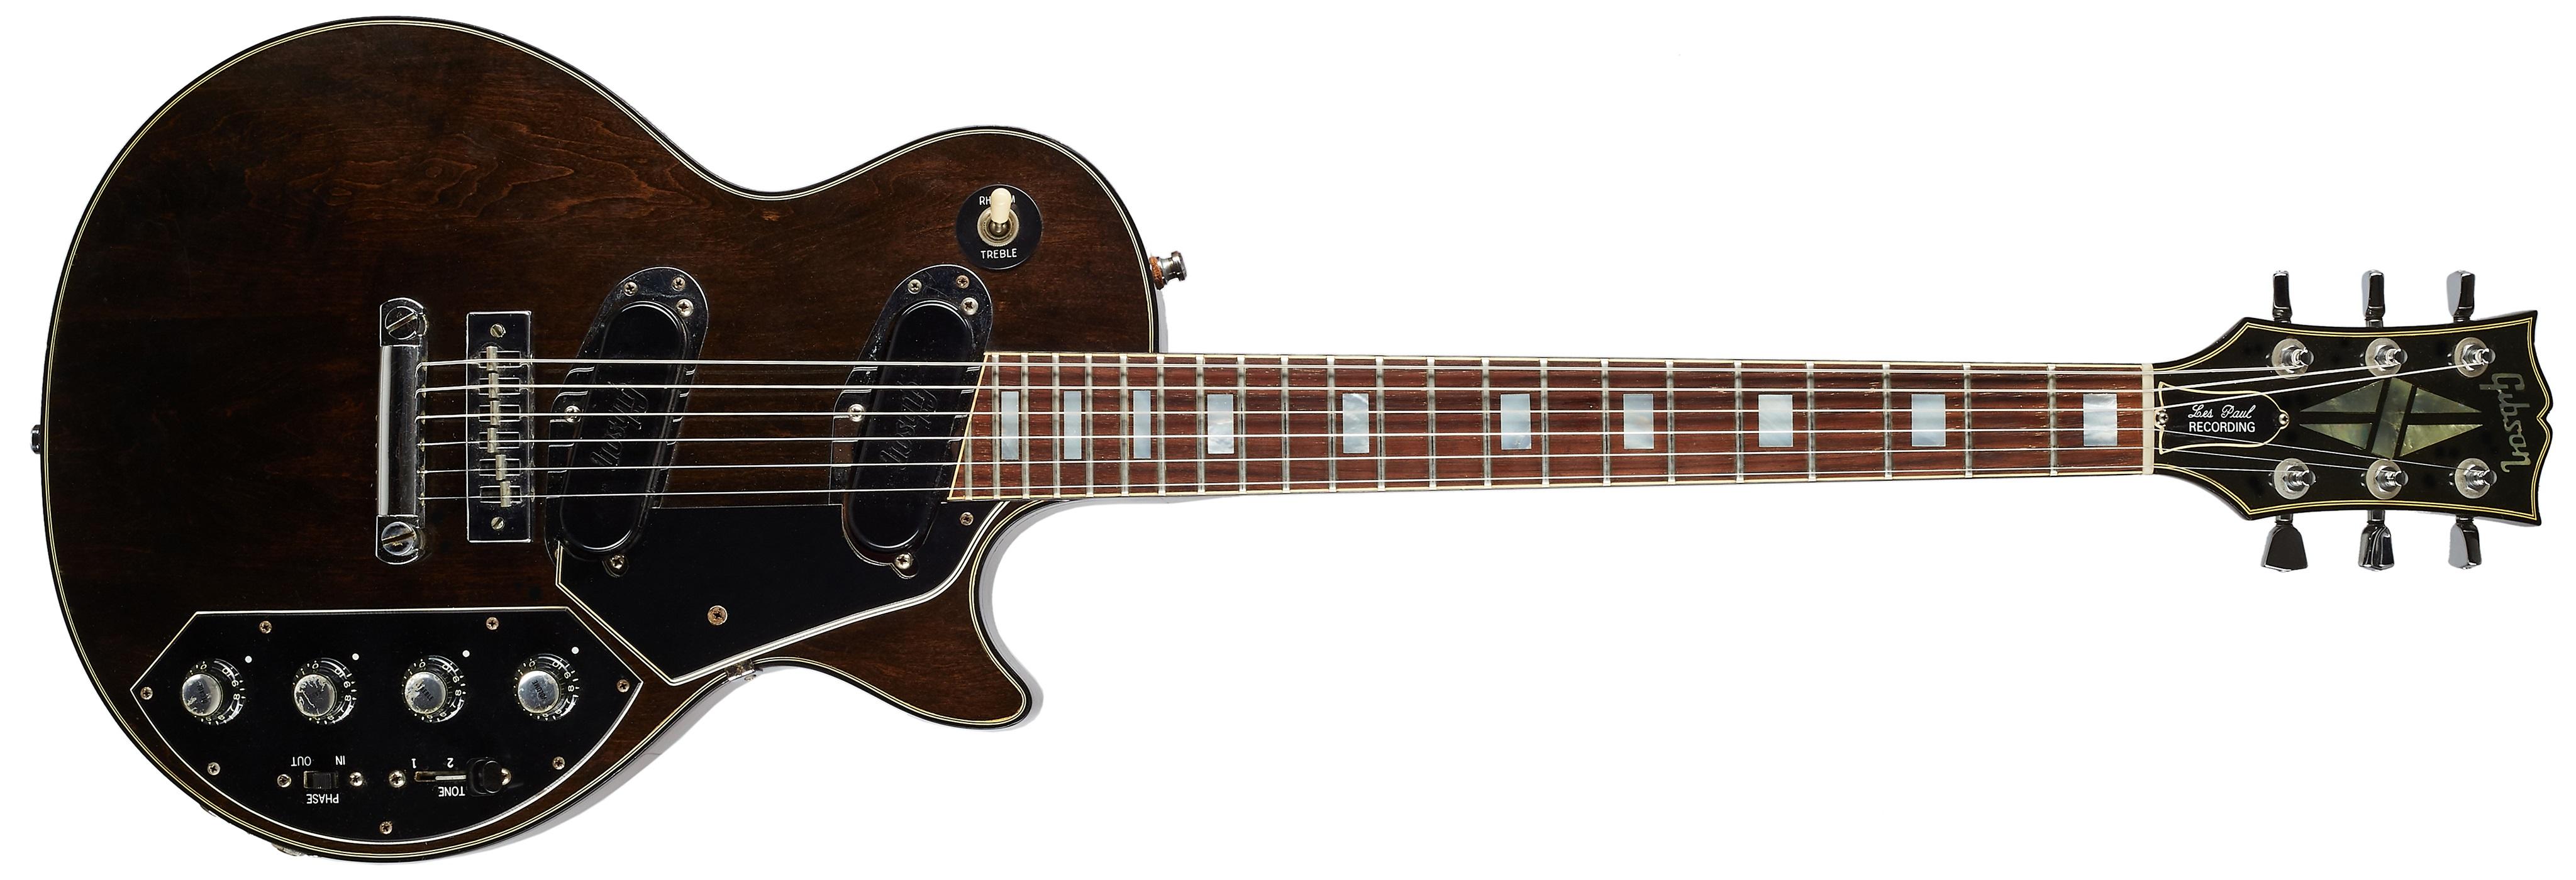 Gibson 1977 Les Paul Recording Walnut 100% Original